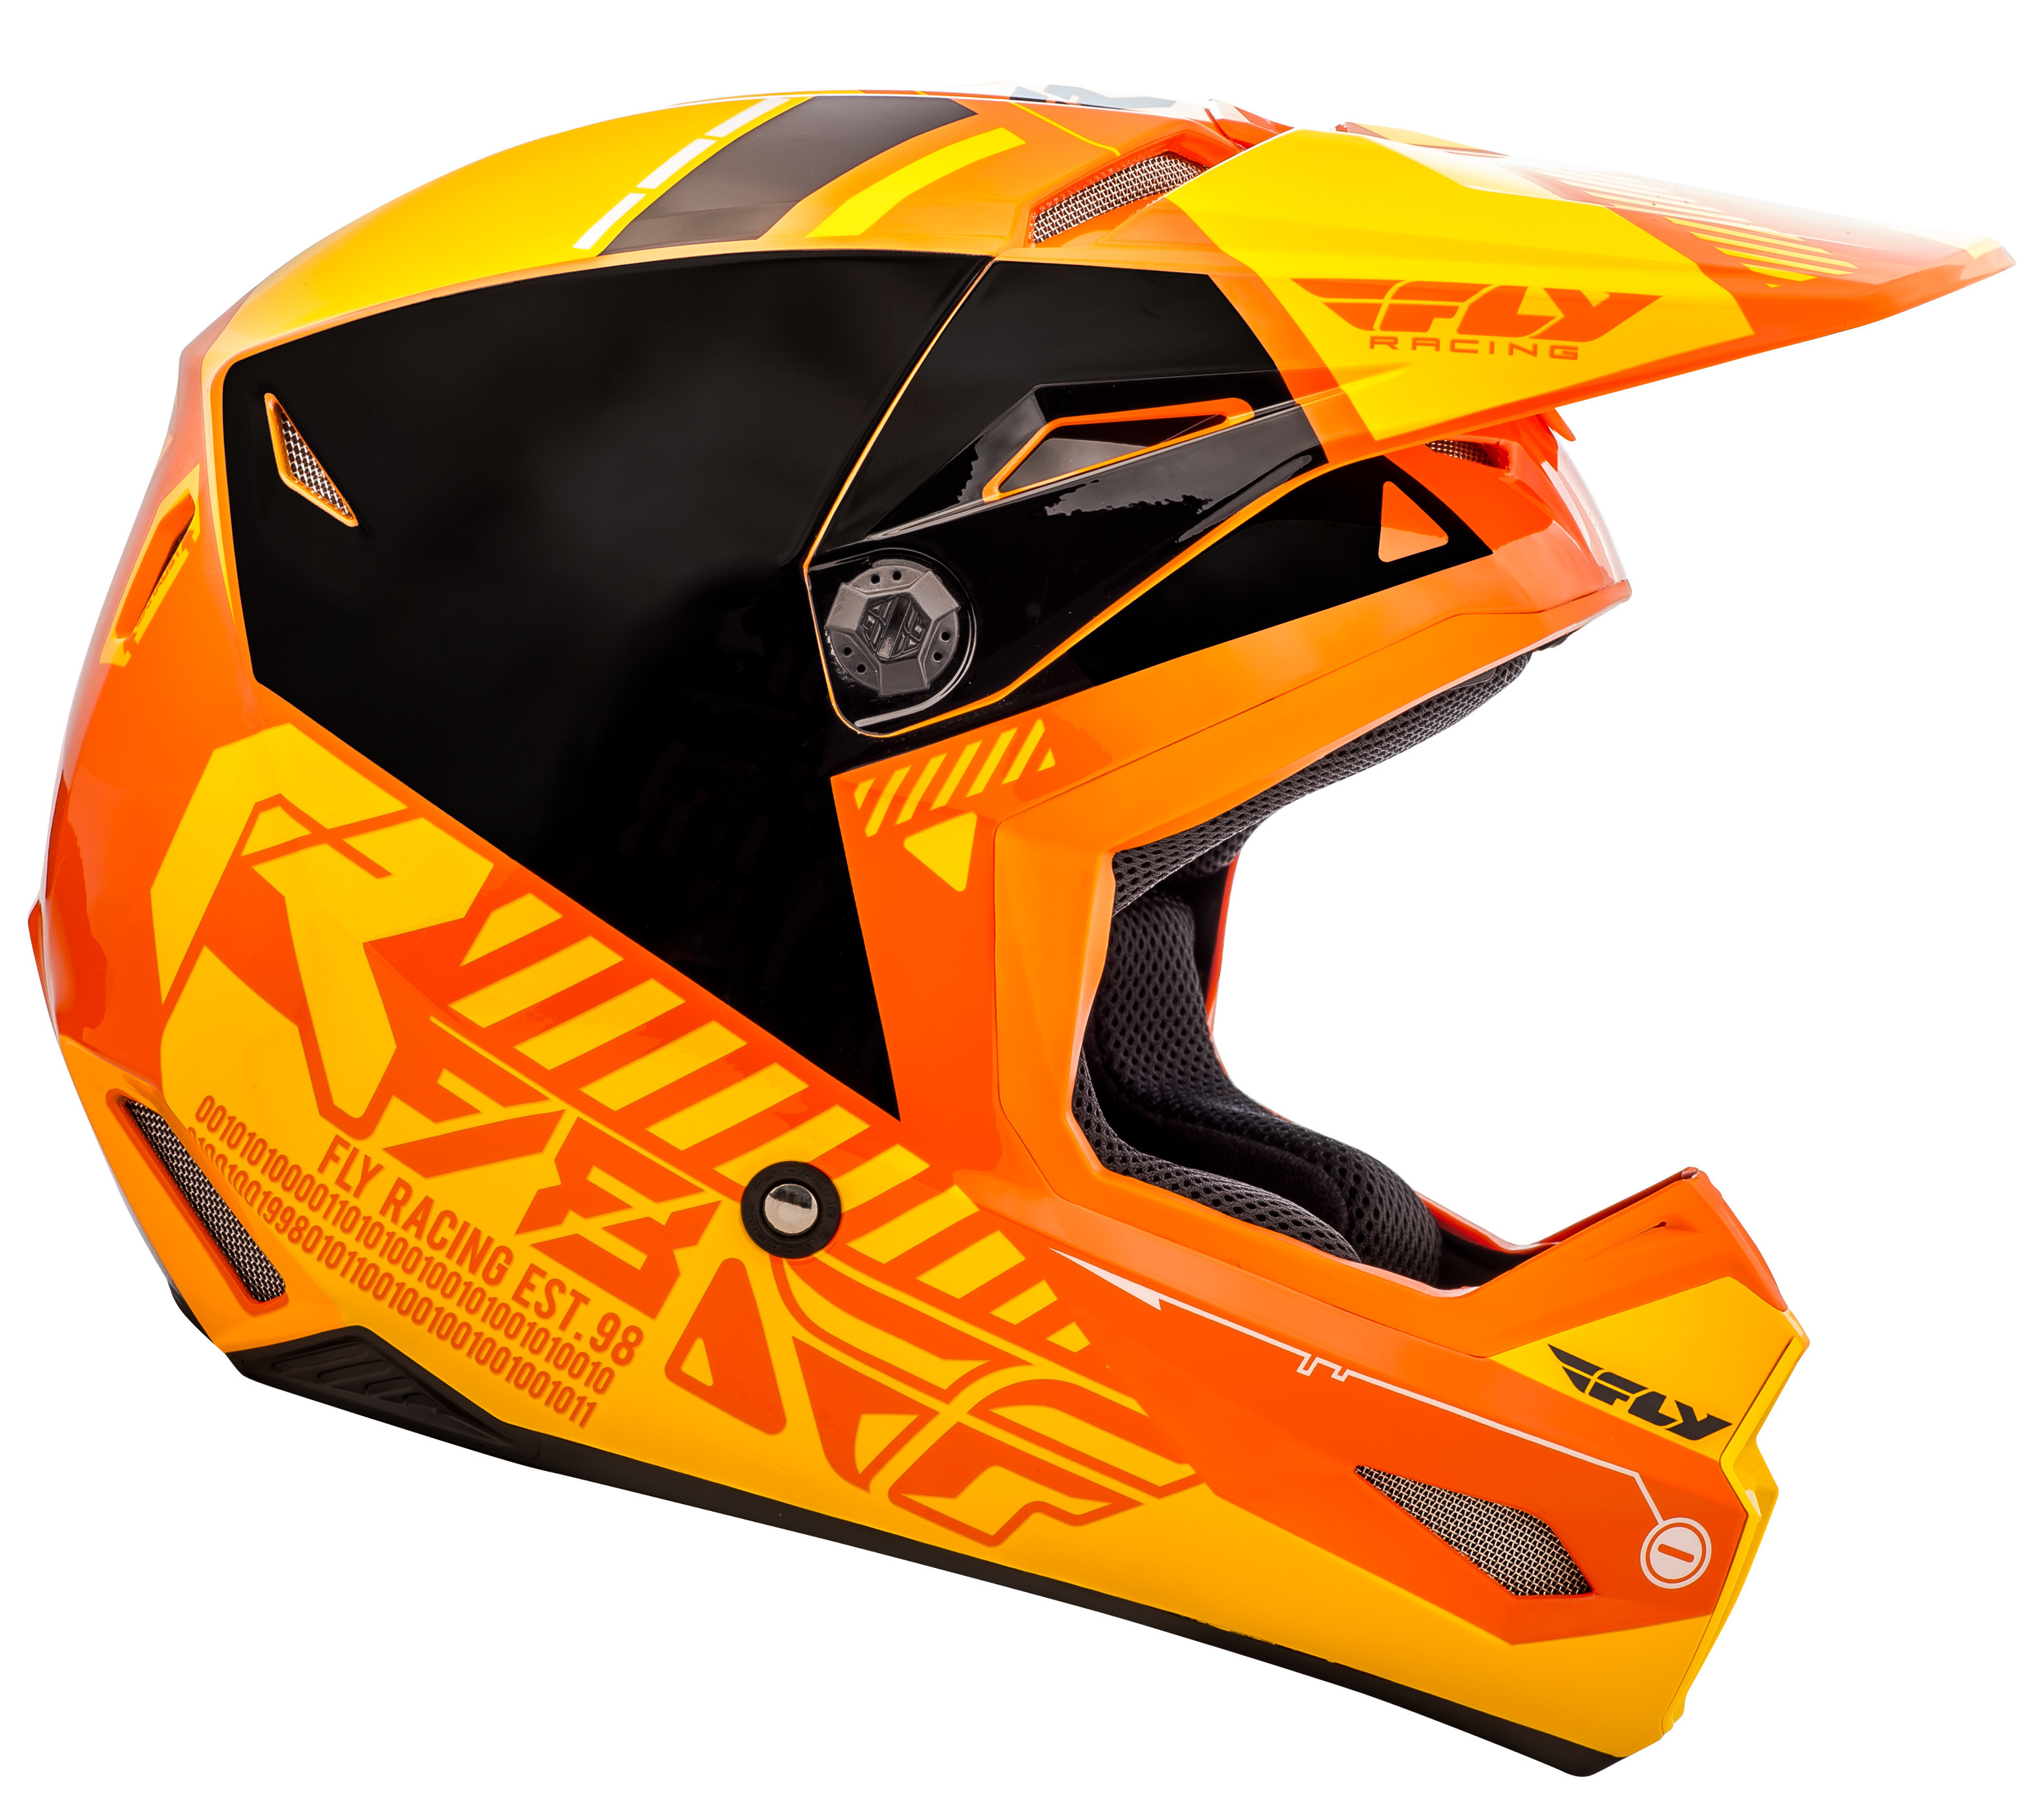 Motocross//Dirt Bike//ATV//MX Fly Racing *Kinetic Elite Onset* Off Road Helmet